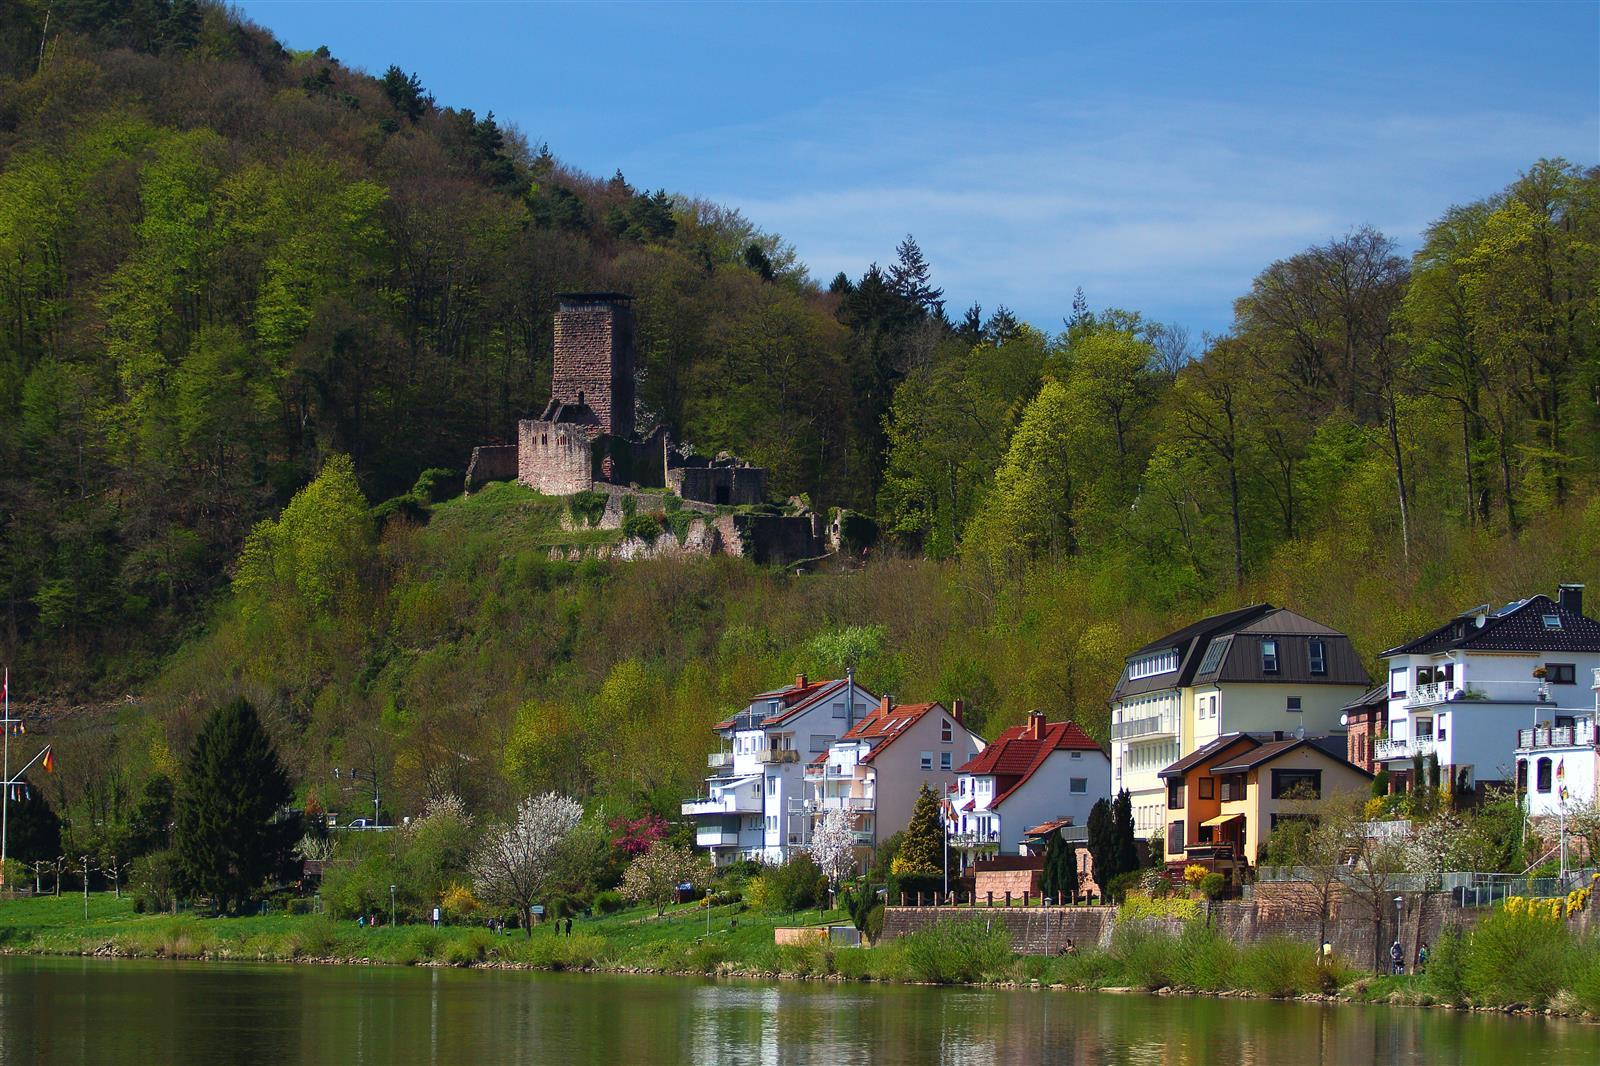 Hanyinfo Nackersteinach And Dilsberg BadenWürttemberg Hessen - Hessen germany